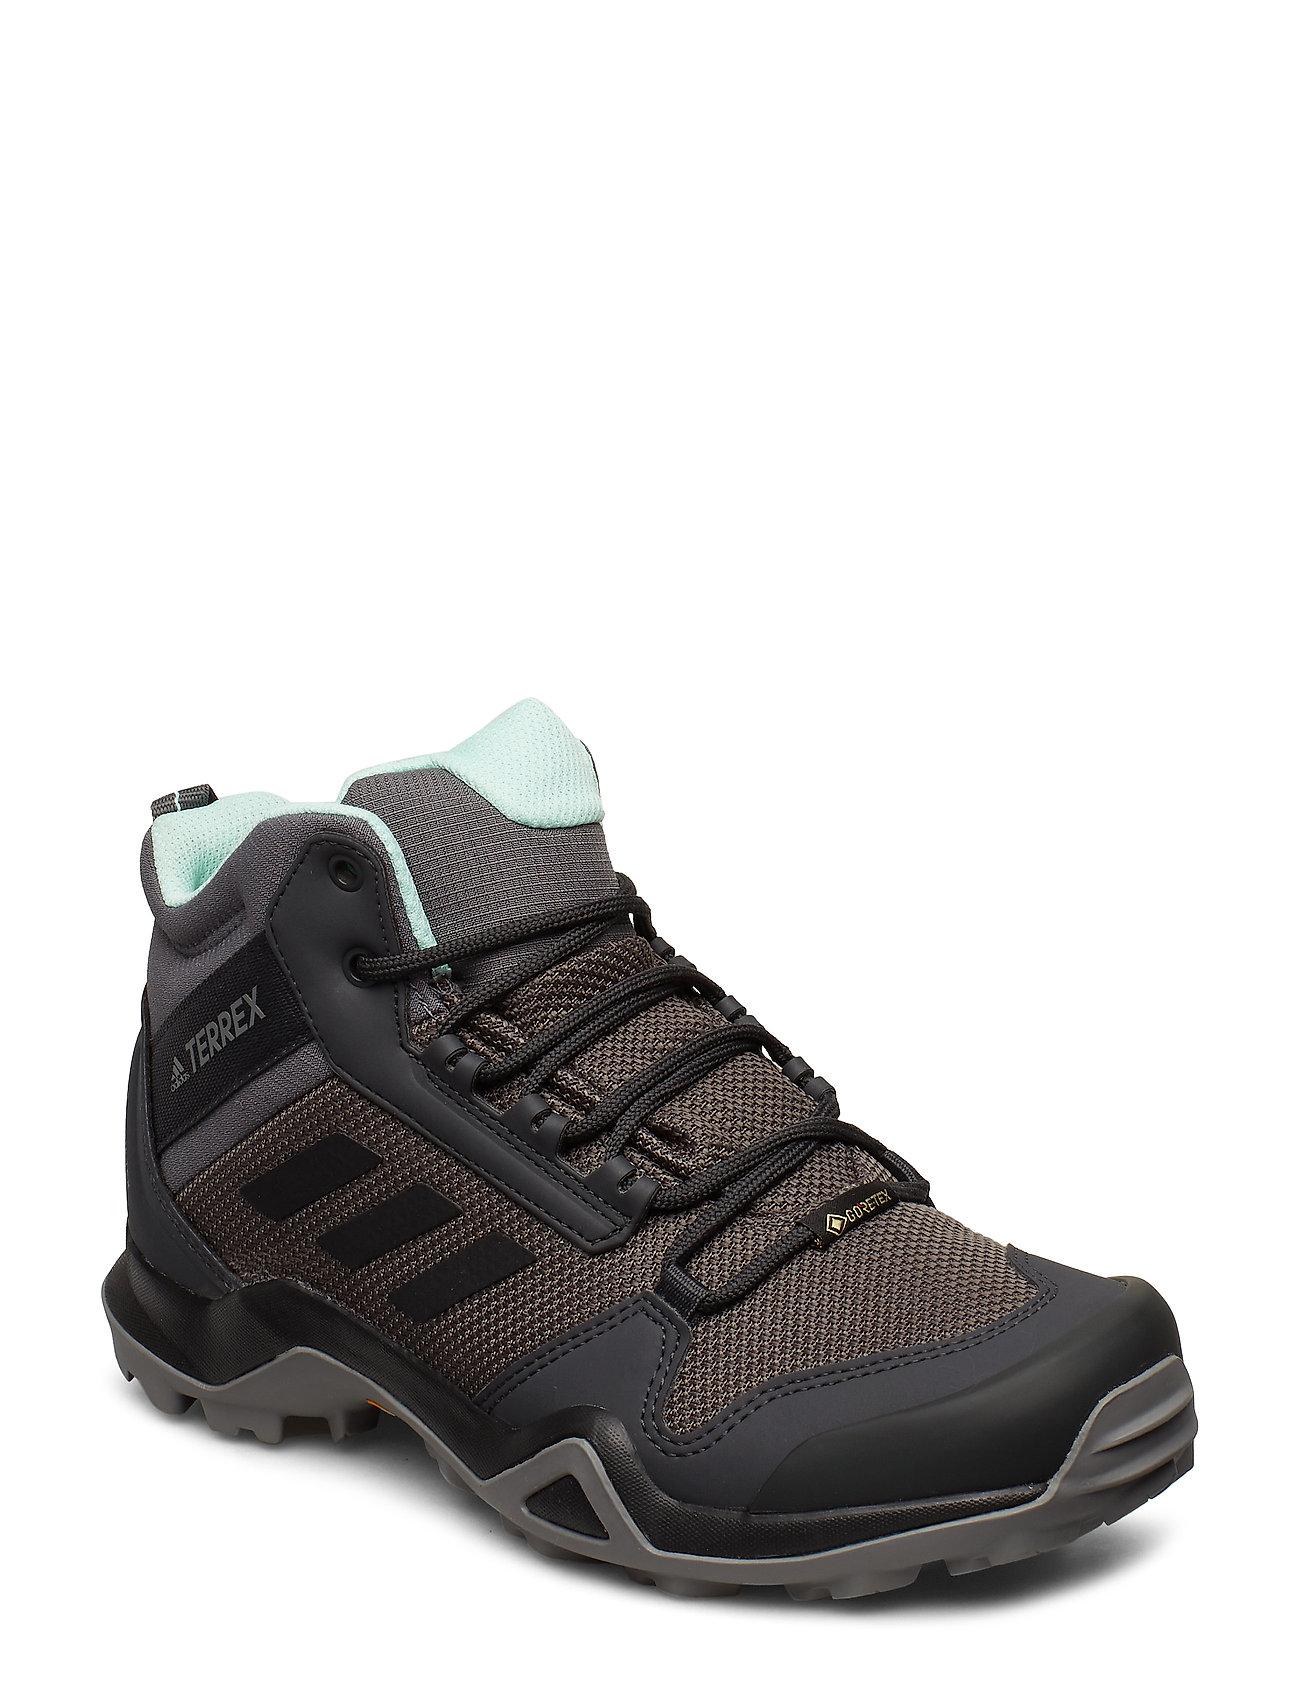 ADIDAS Sneaker | Terrex Ax3 Mid Gtx W Shoes Sport Shoes Training Shoes- Golf/tennis/fitness Grau ADIDAS PERFORMANCE